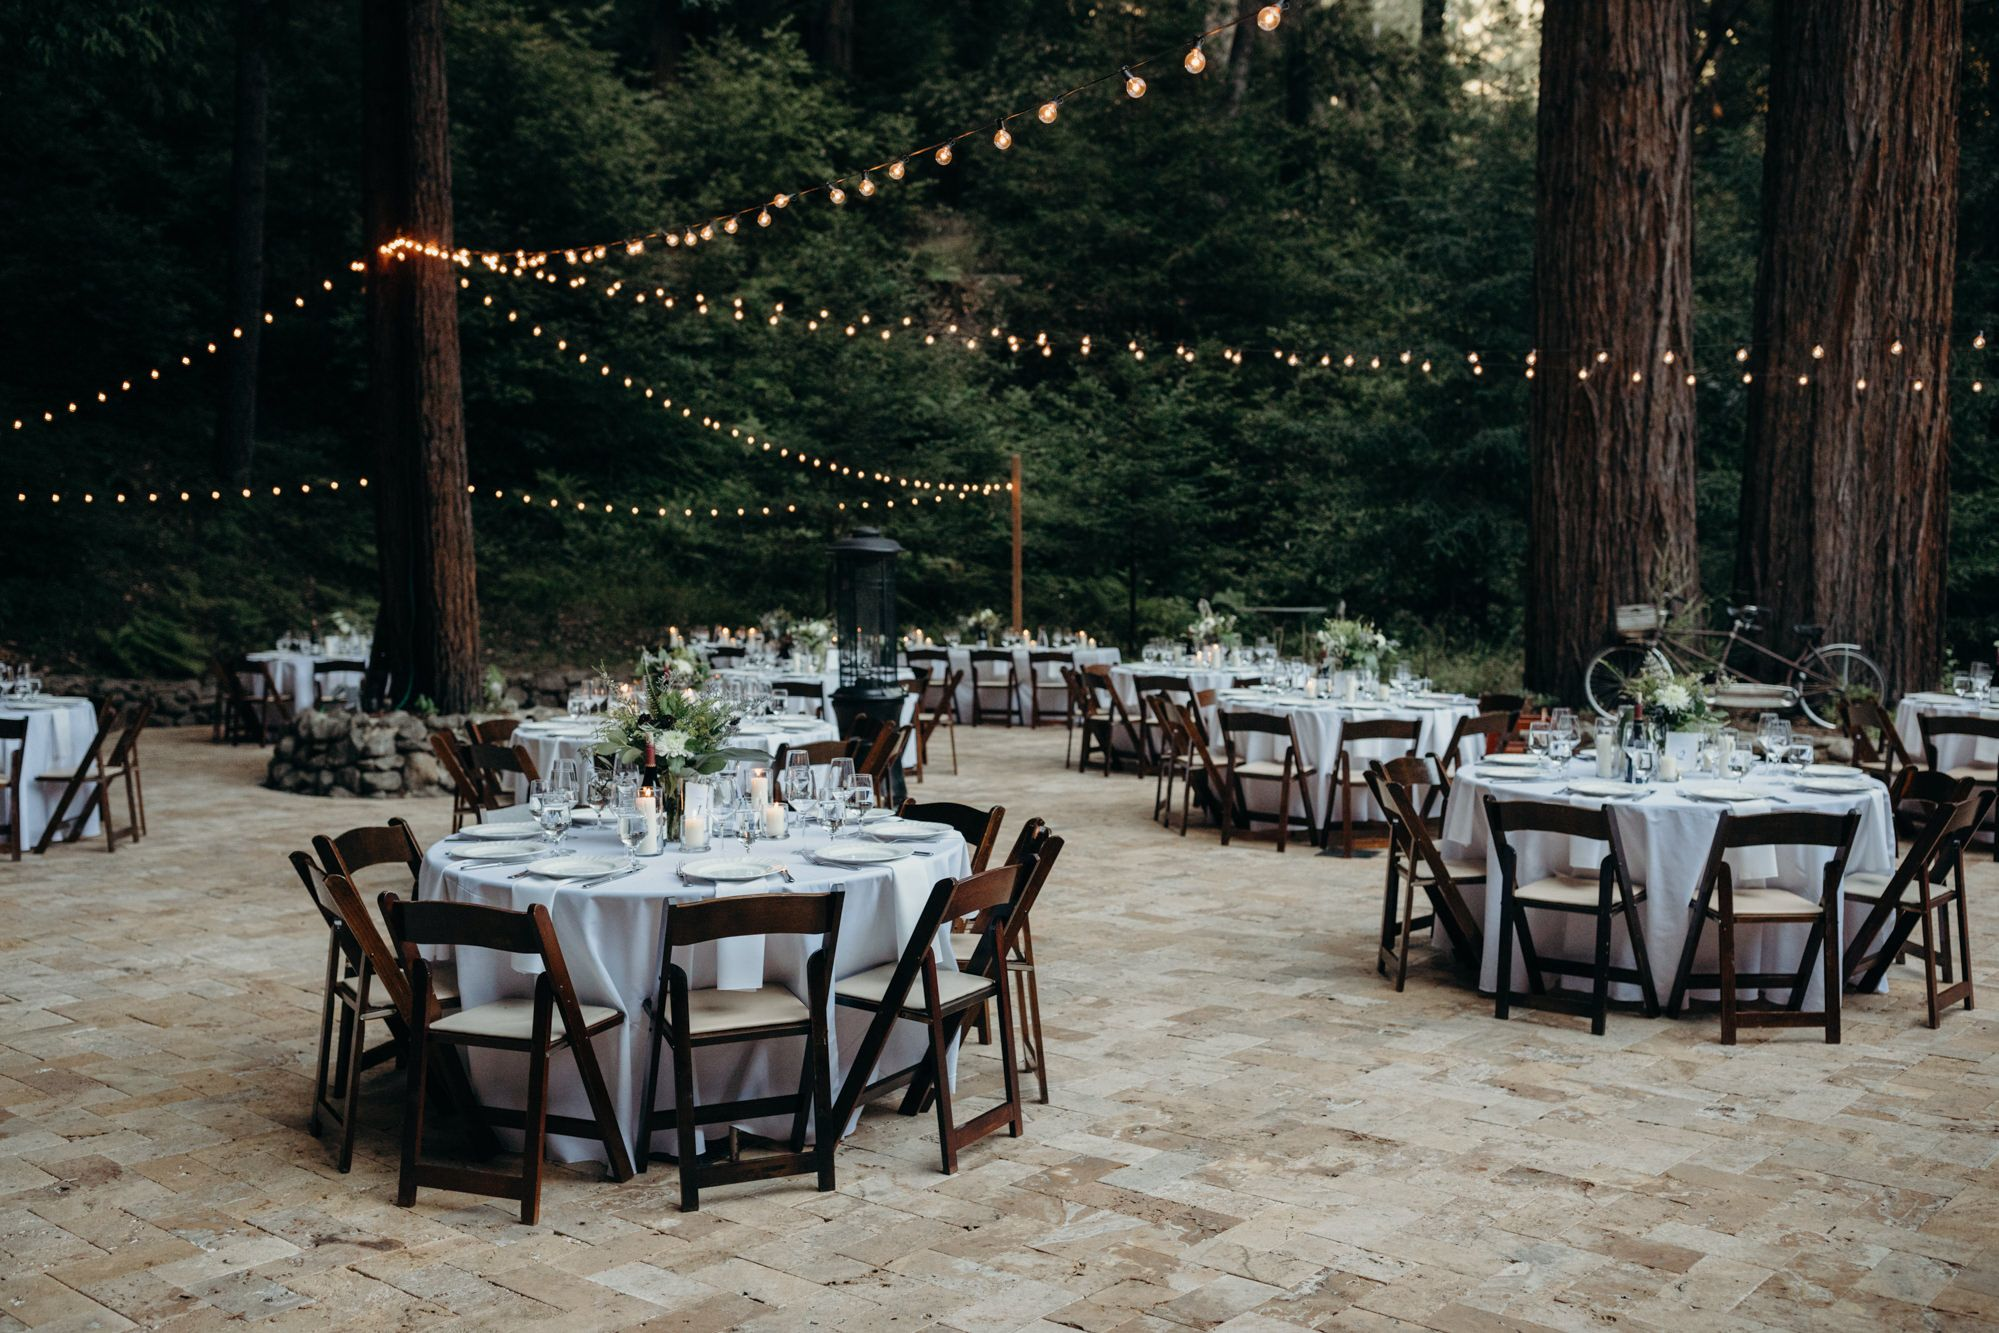 Waterfall Lodge And Retreat Weddings In Ben Lomond California Santa Cruz Mountains Wedding Venue Forest Wedding Venue Wedding Locations California California Wedding Venues Cheap